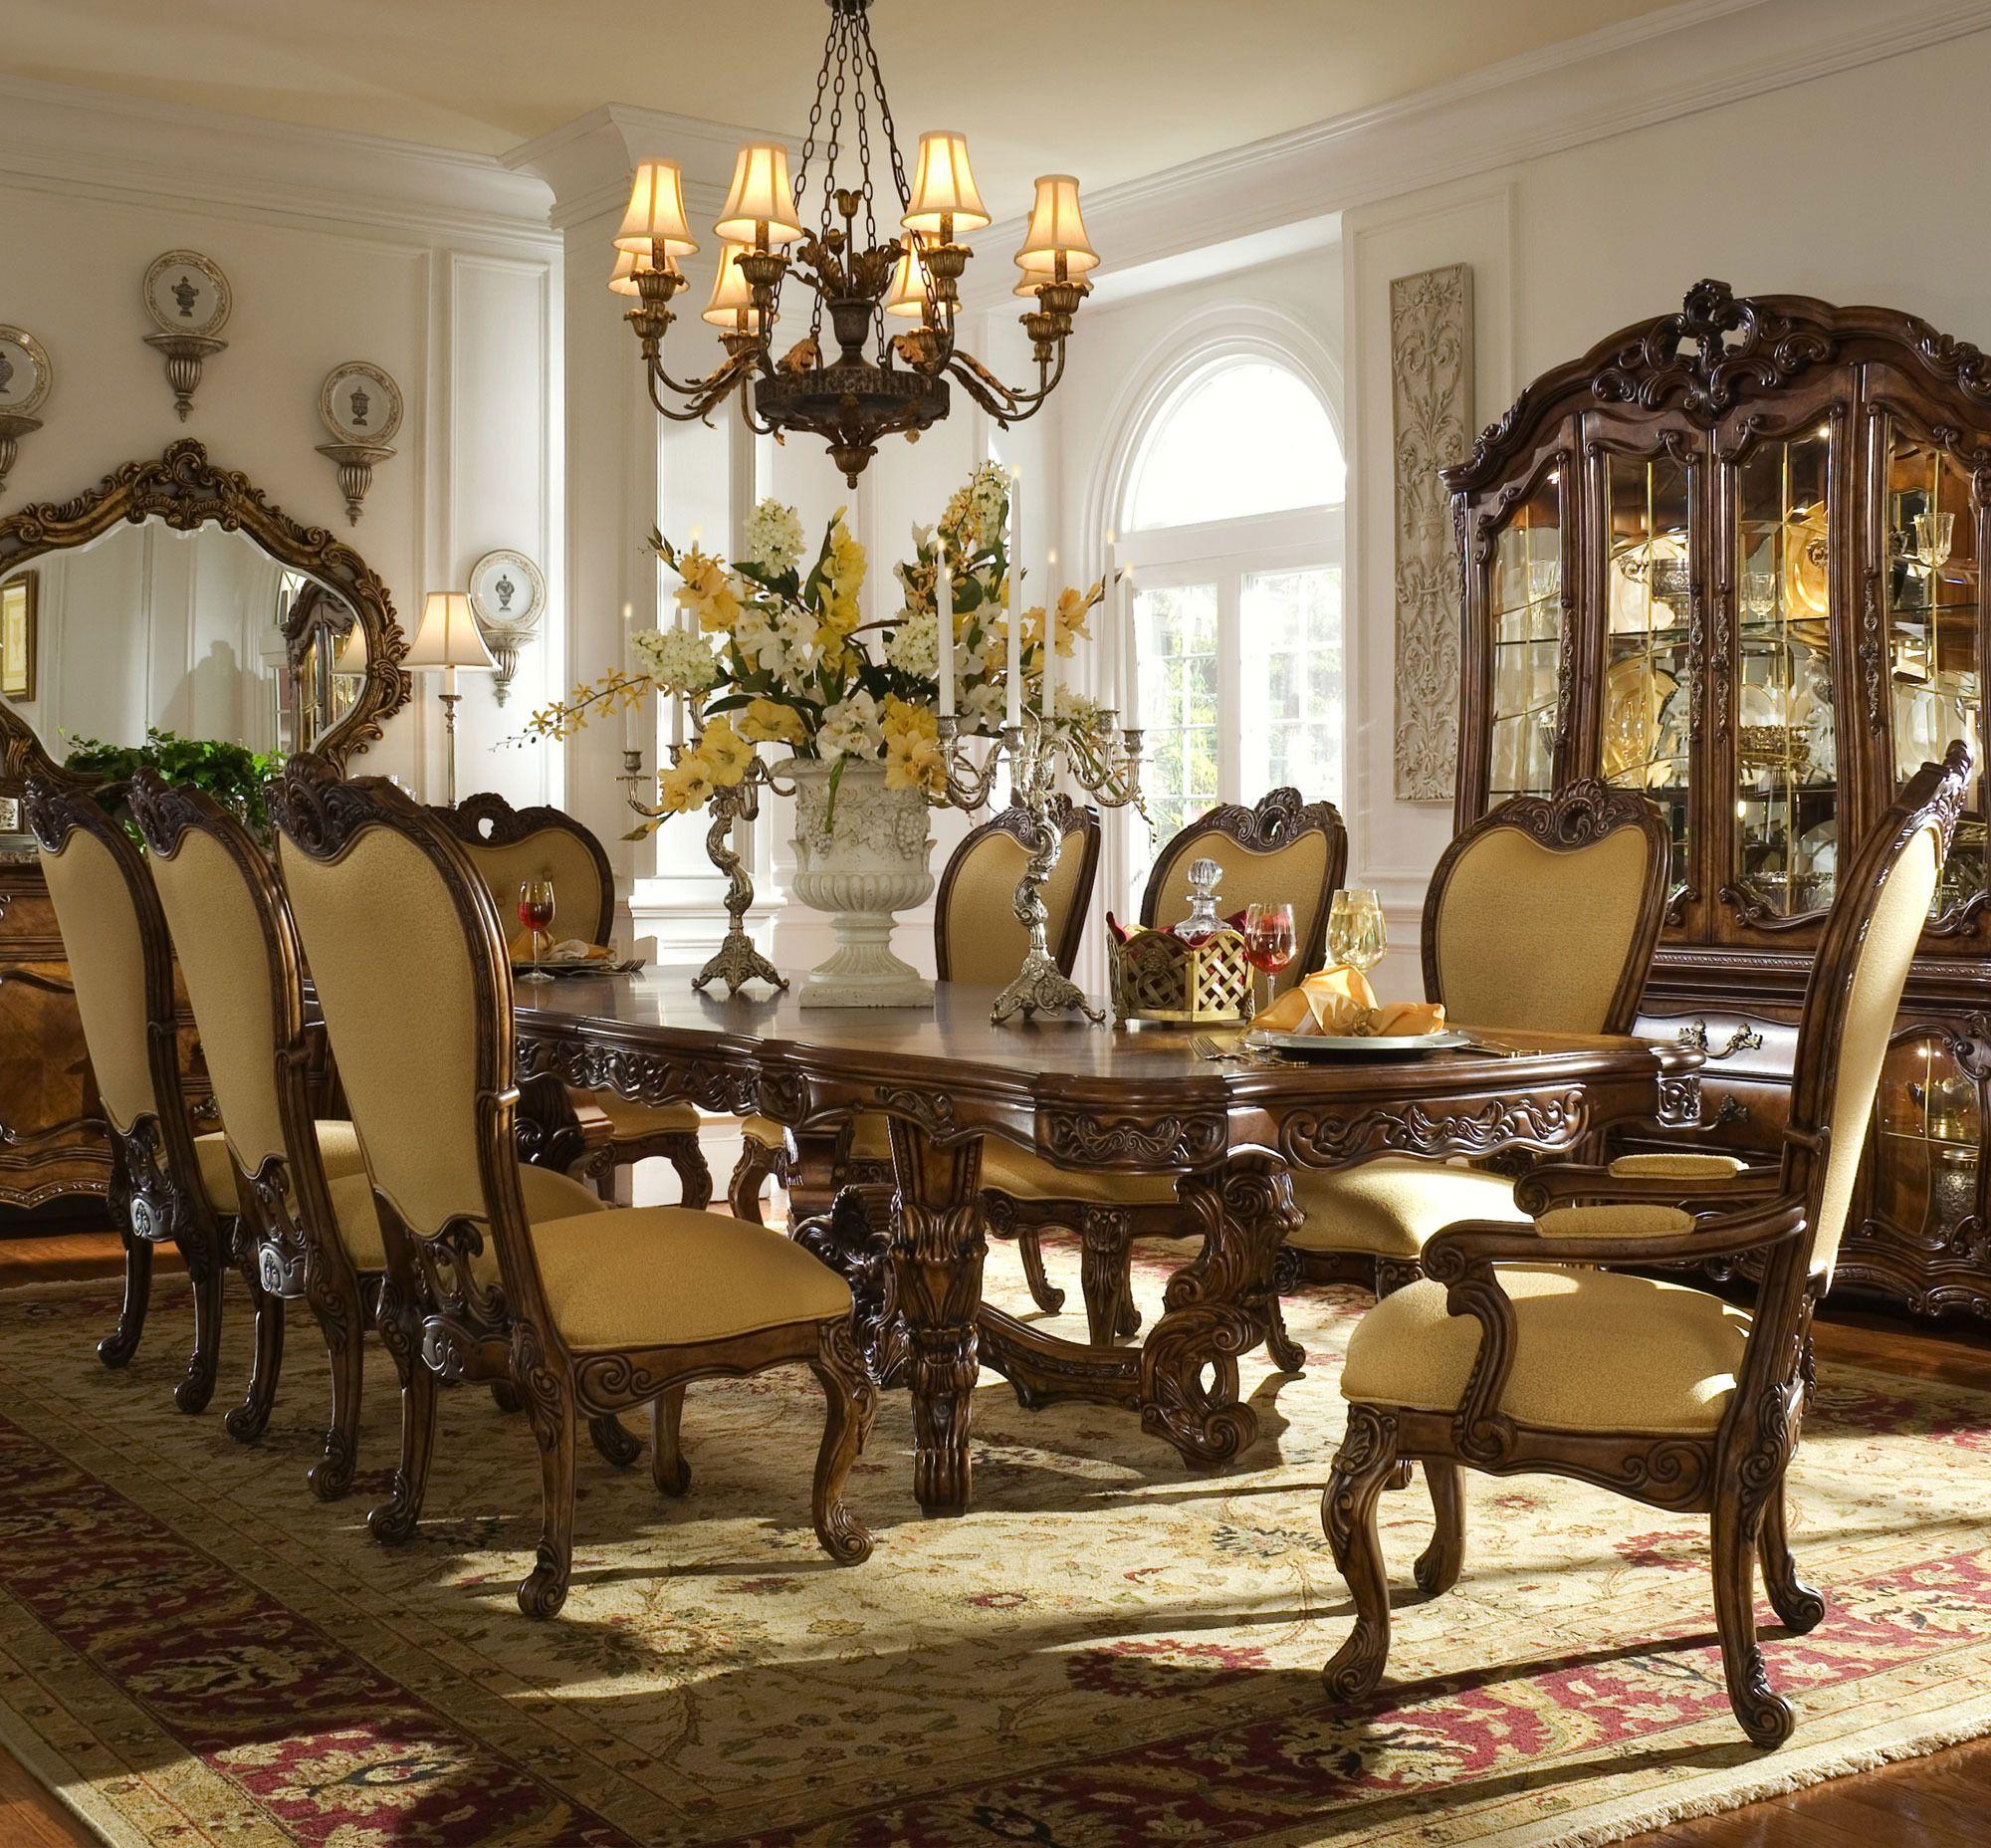 Palais Royale Rectangular Table Dining Set Michael Amini Aico